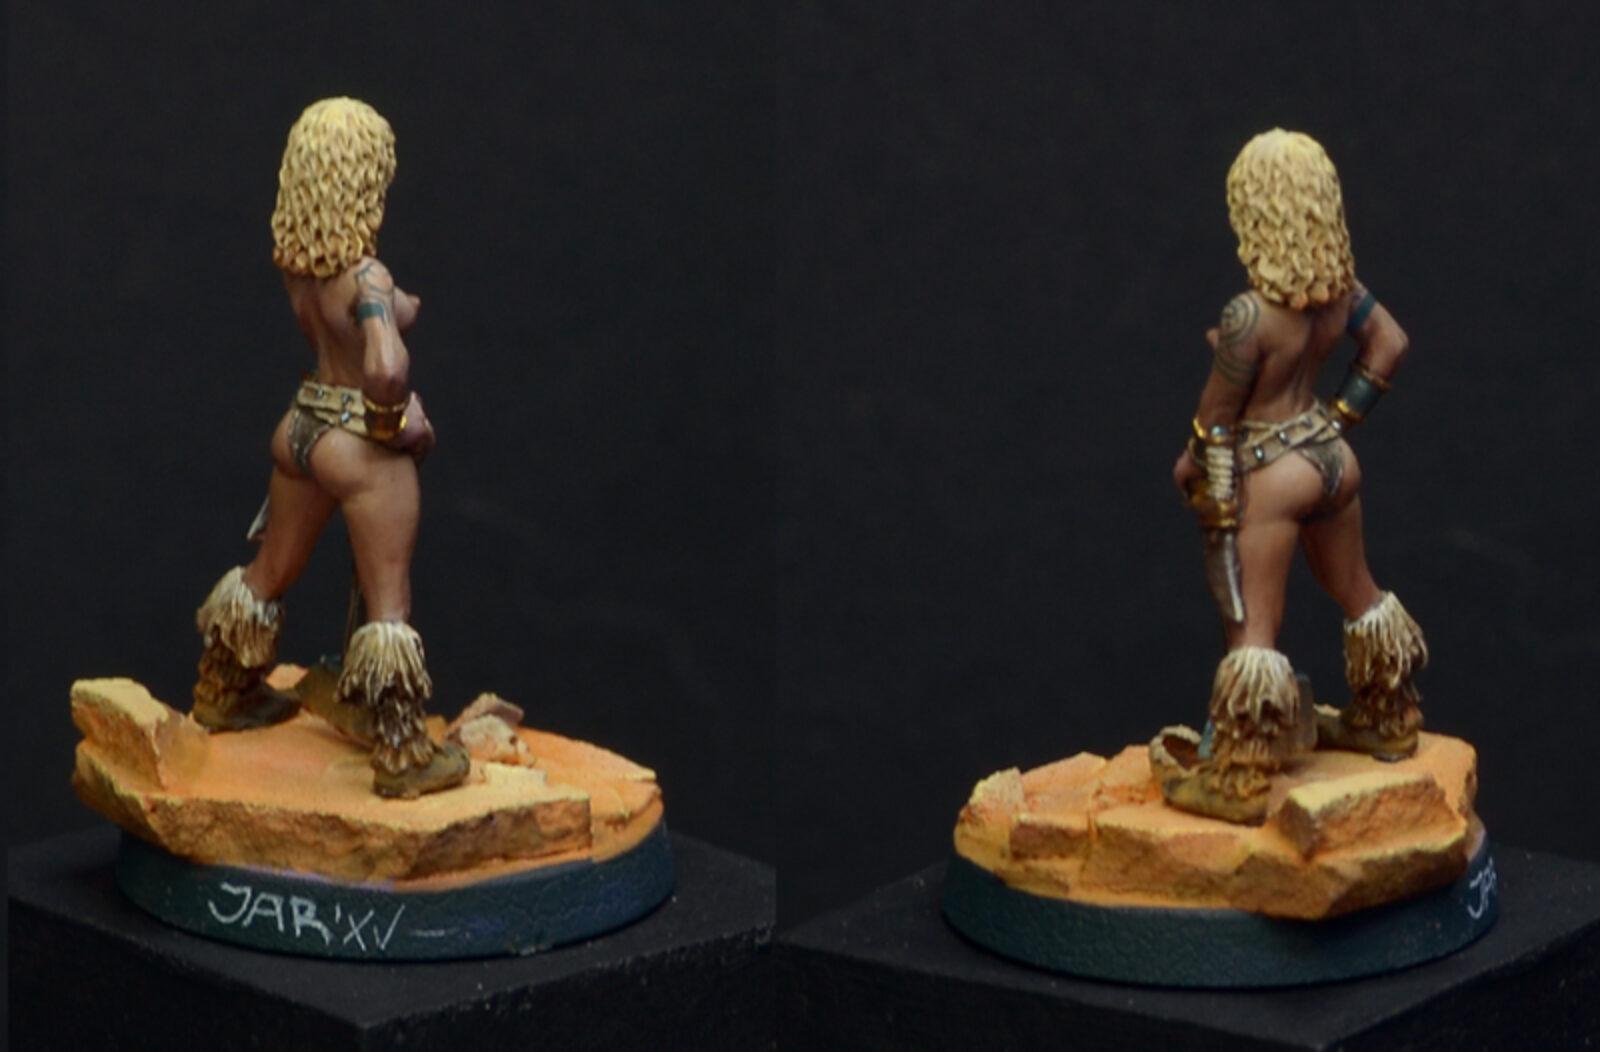 Hf Barb Zeta03